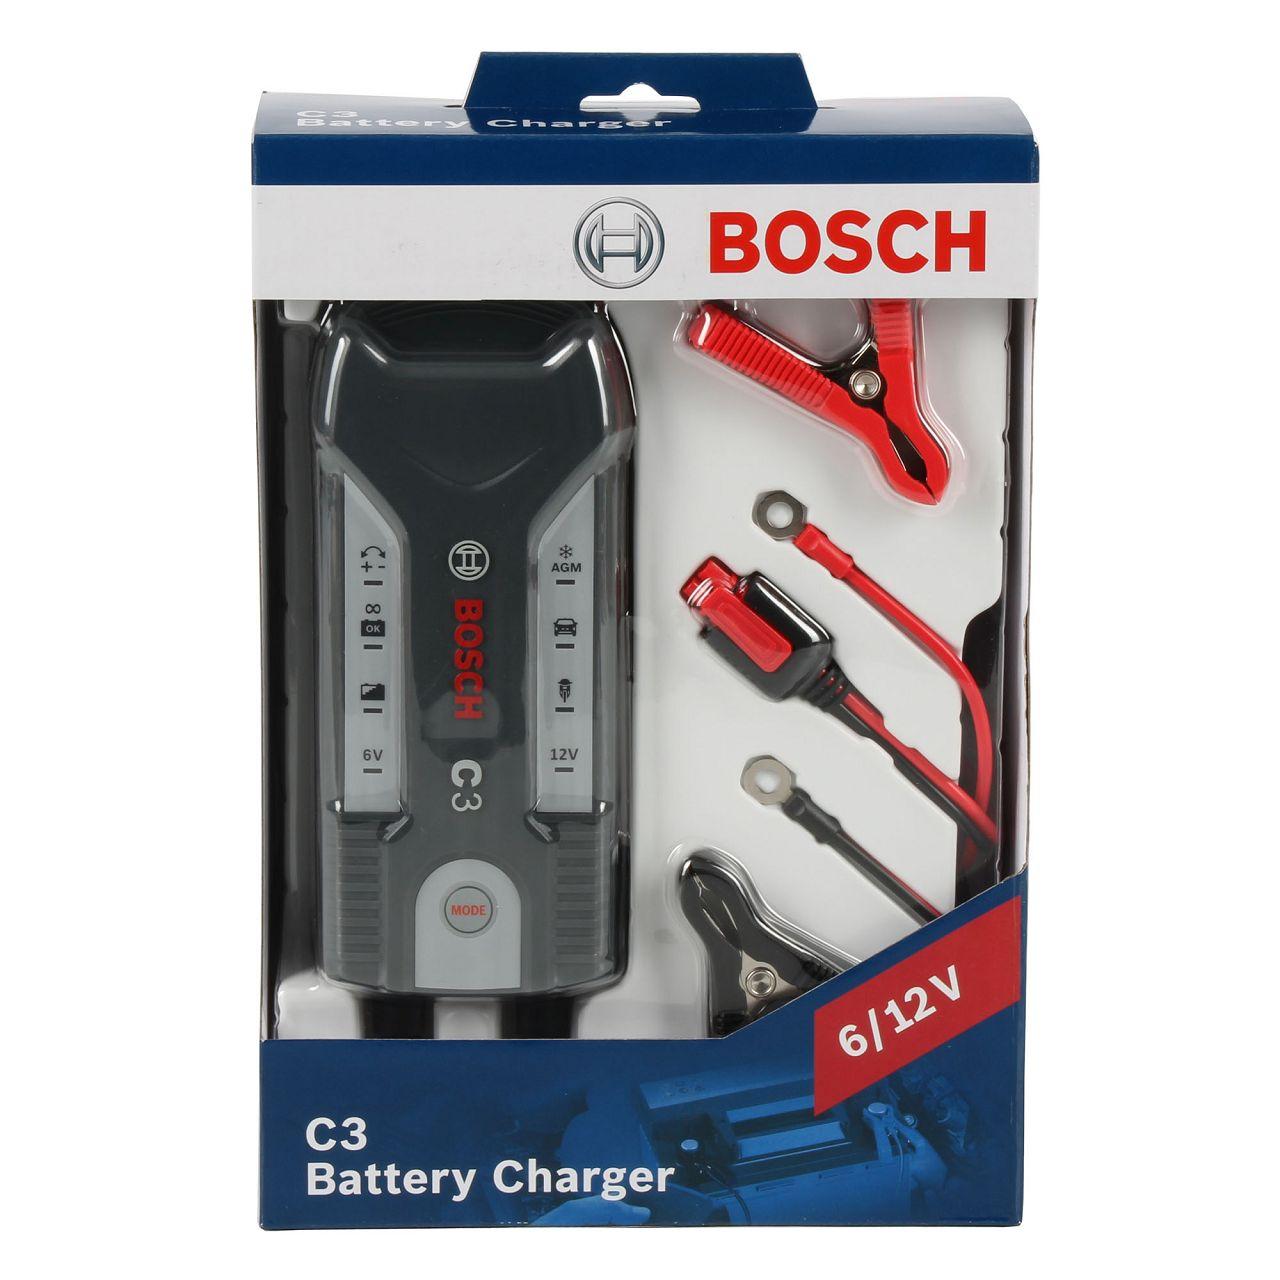 BOSCH 018999903M Mikroprozessor-Batterieladegerät C3 6V-12V Automatik 120Ah